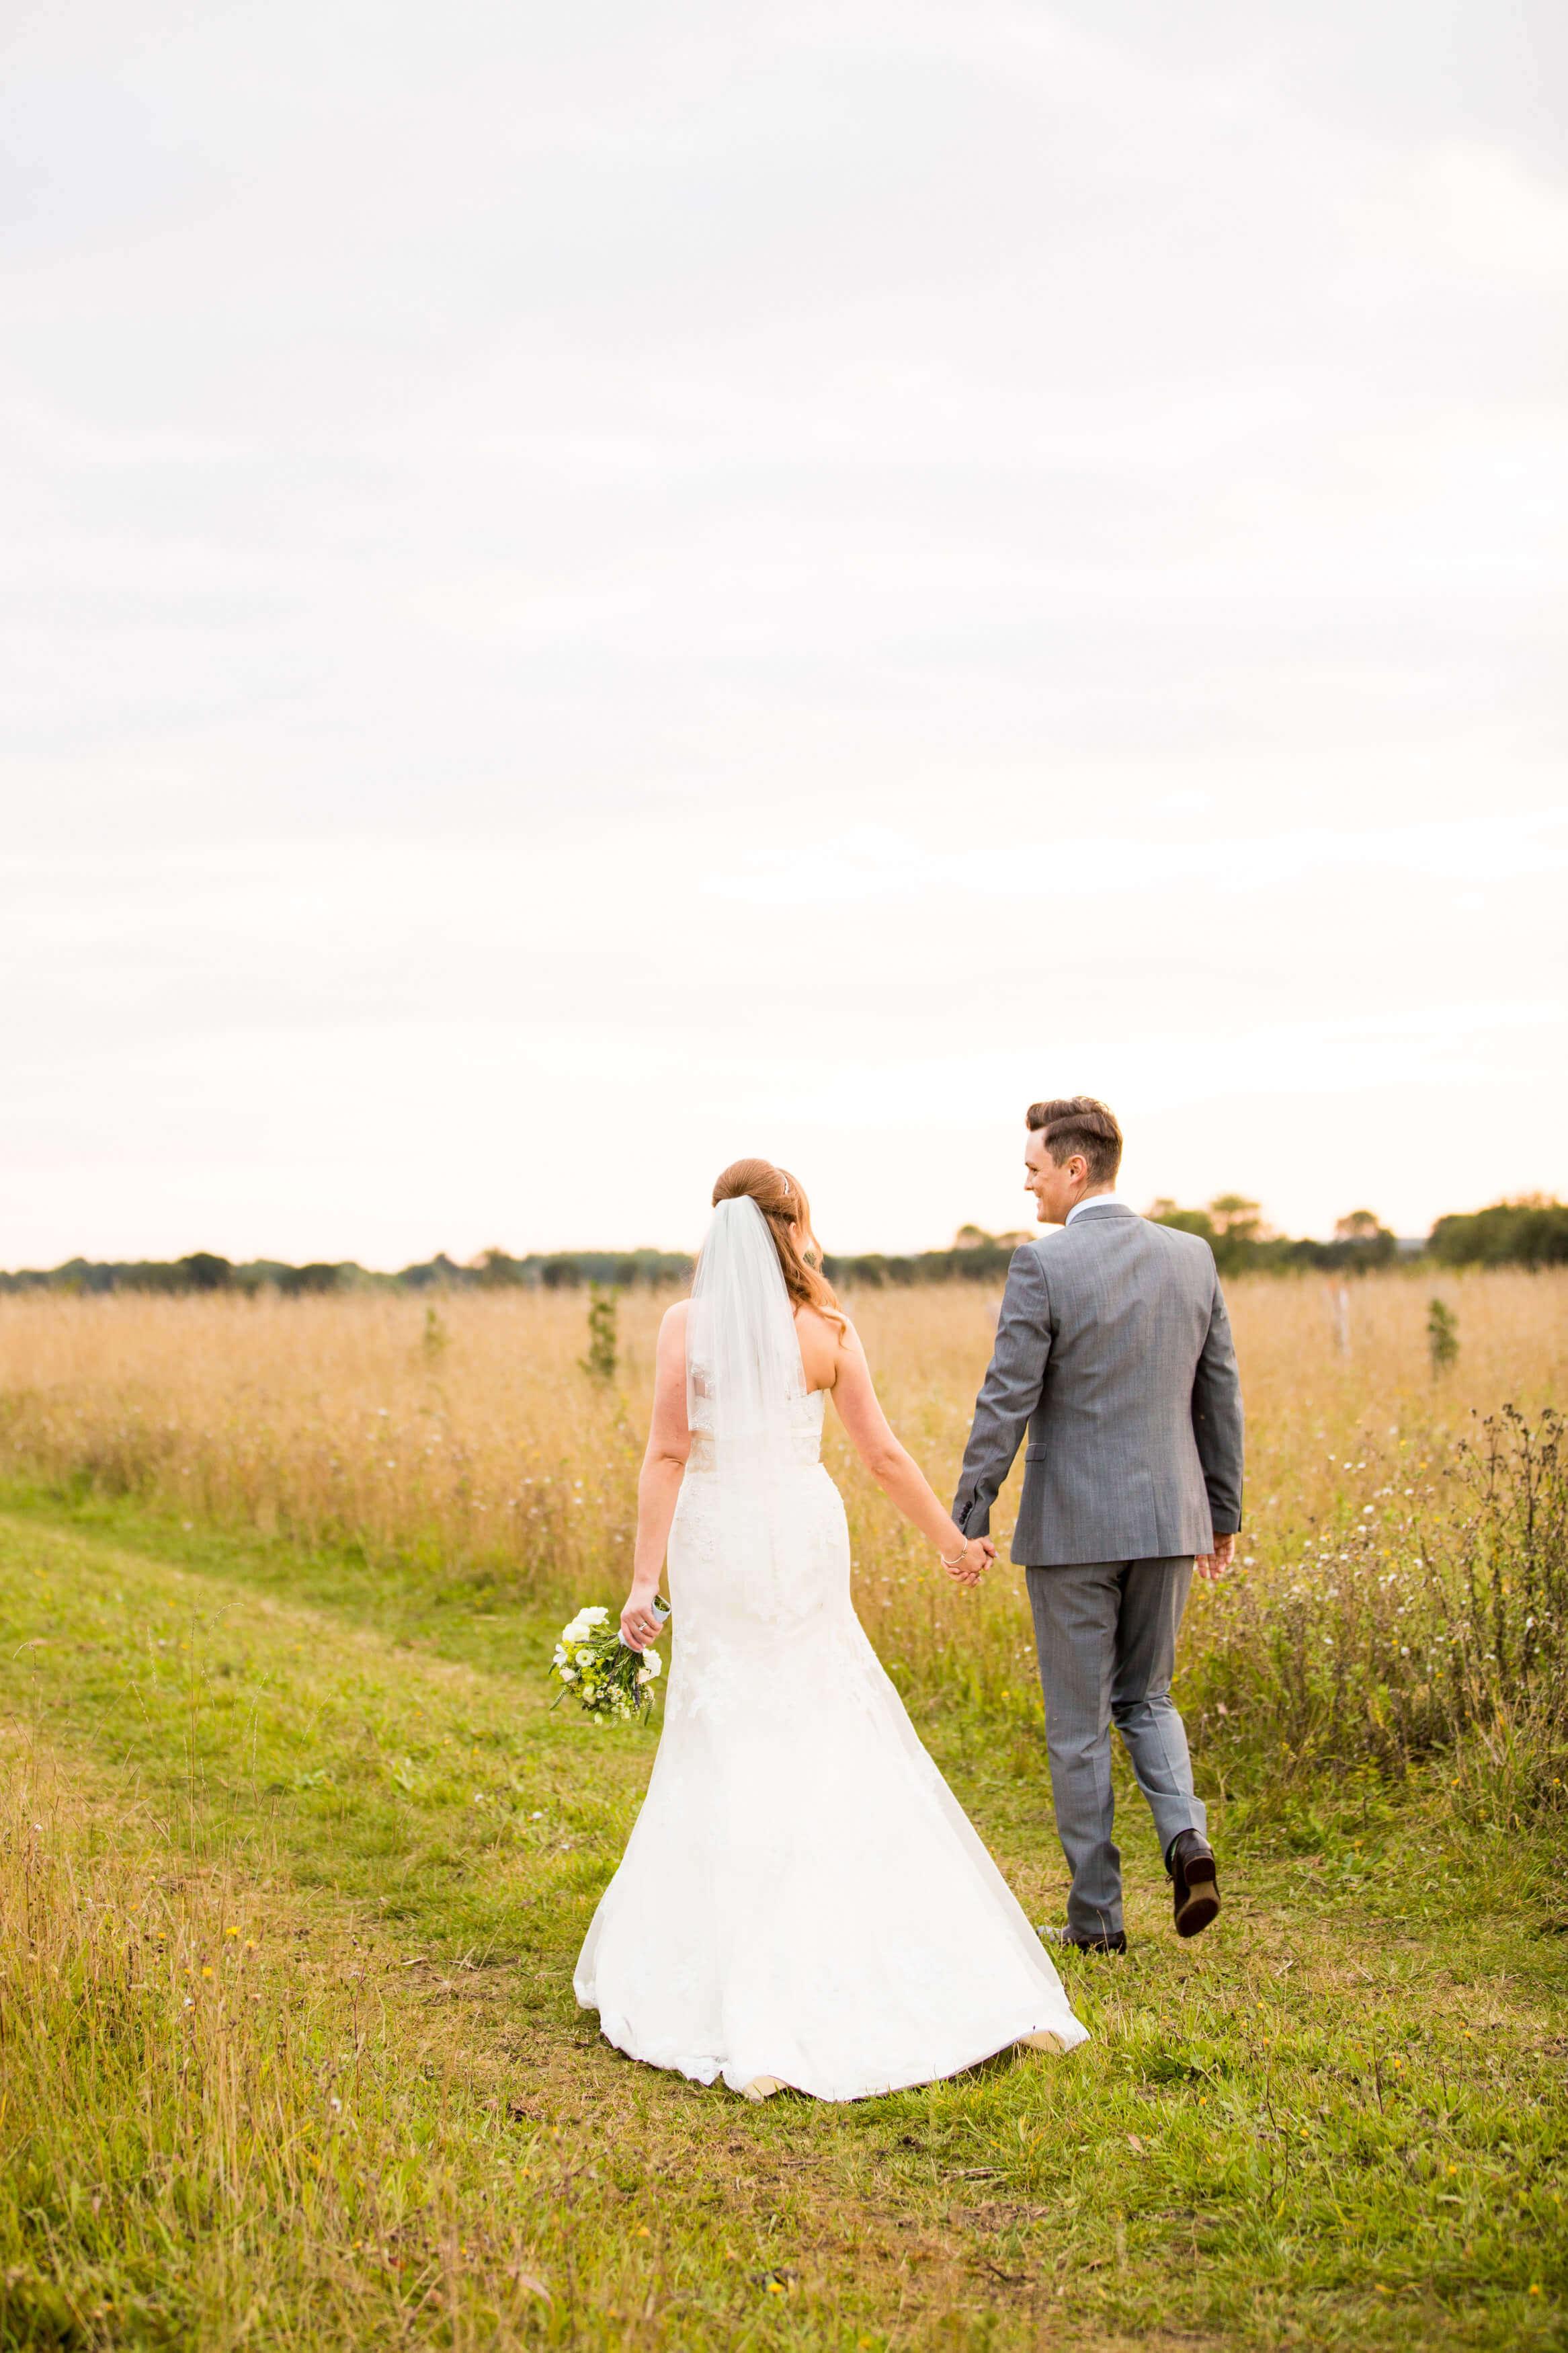 essex-wedding-planner-countryside-wedding-photos.jpg